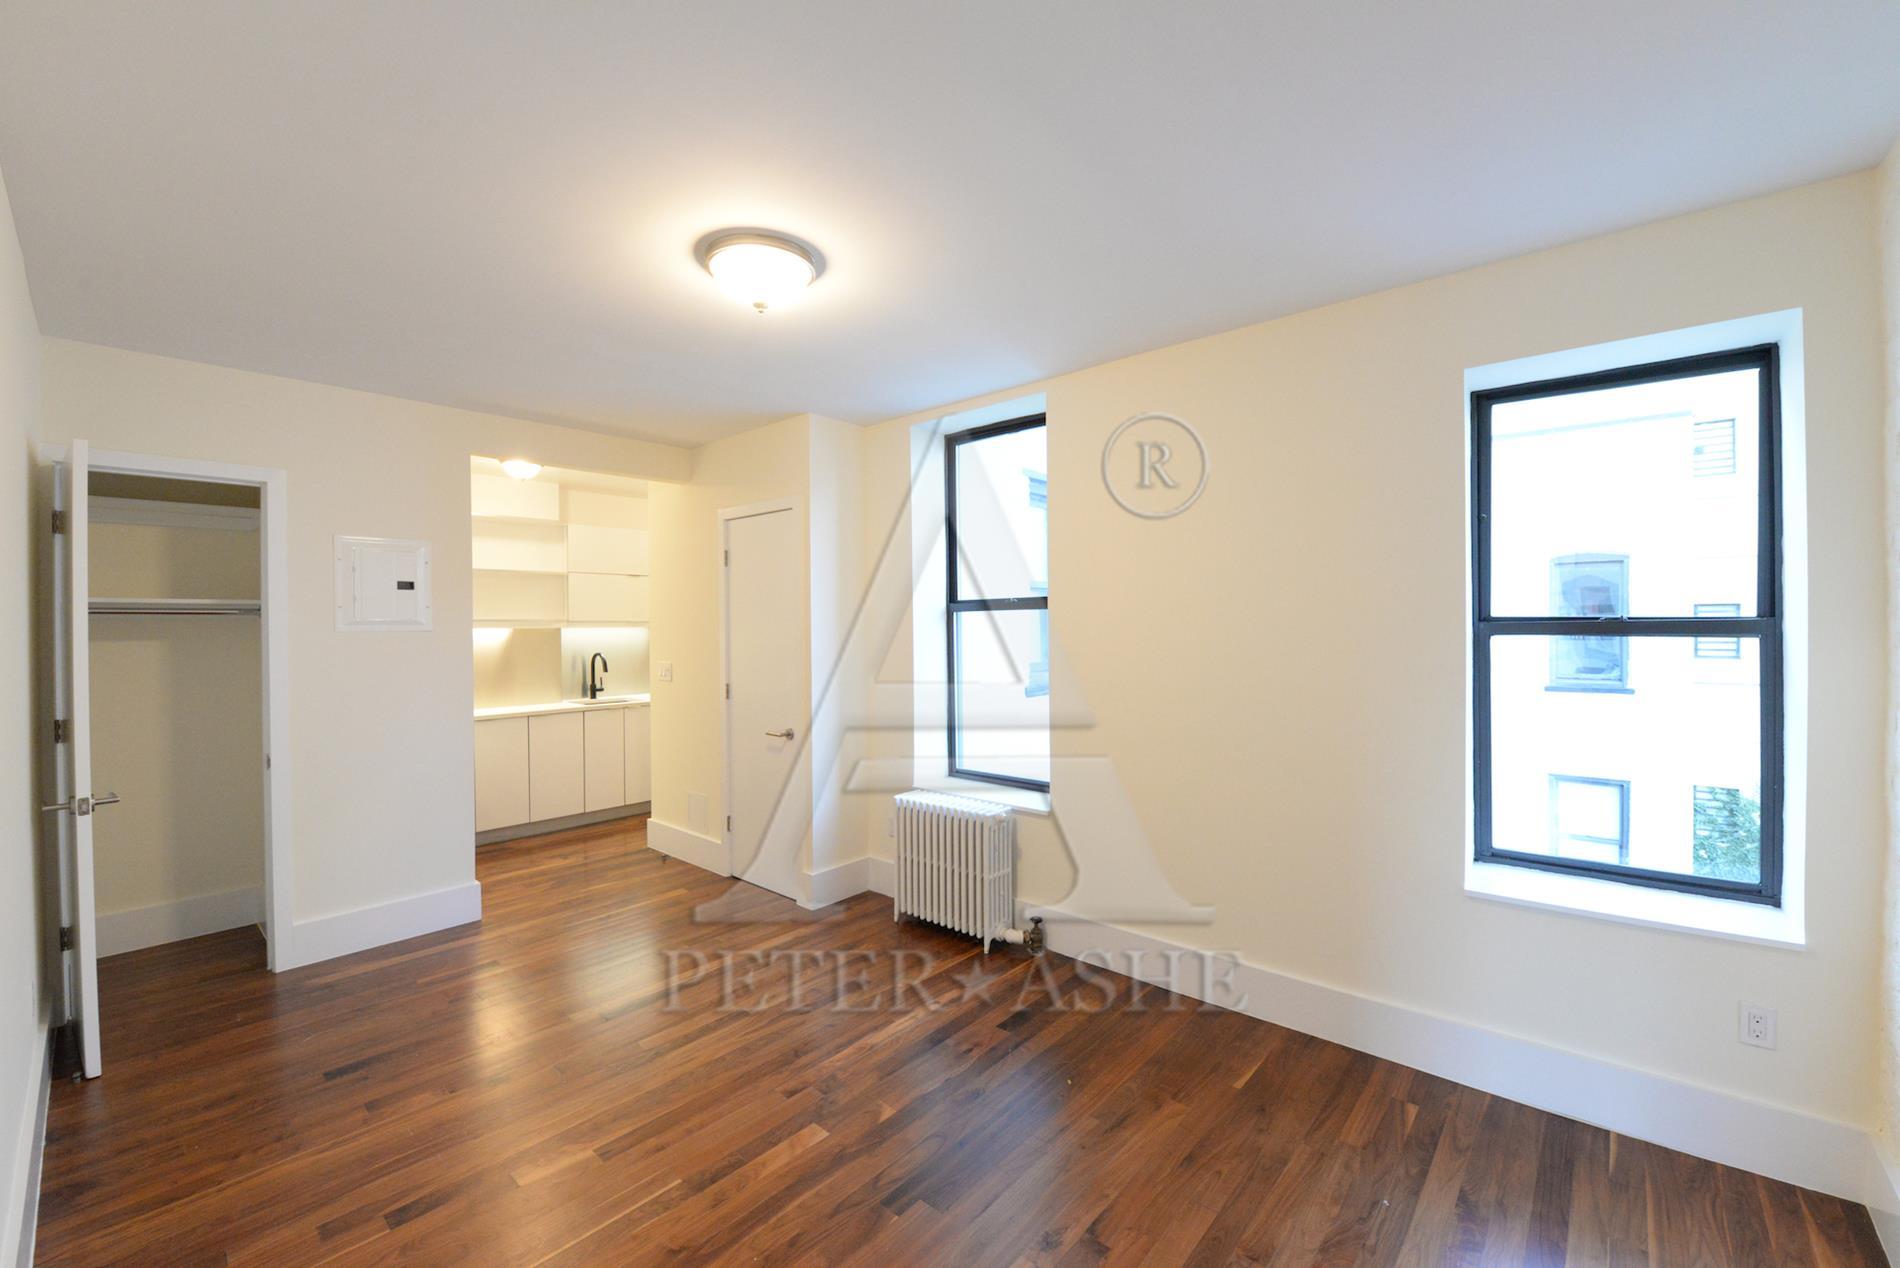 455 Hudson Street, Apt 18, Manhattan, New York 10014